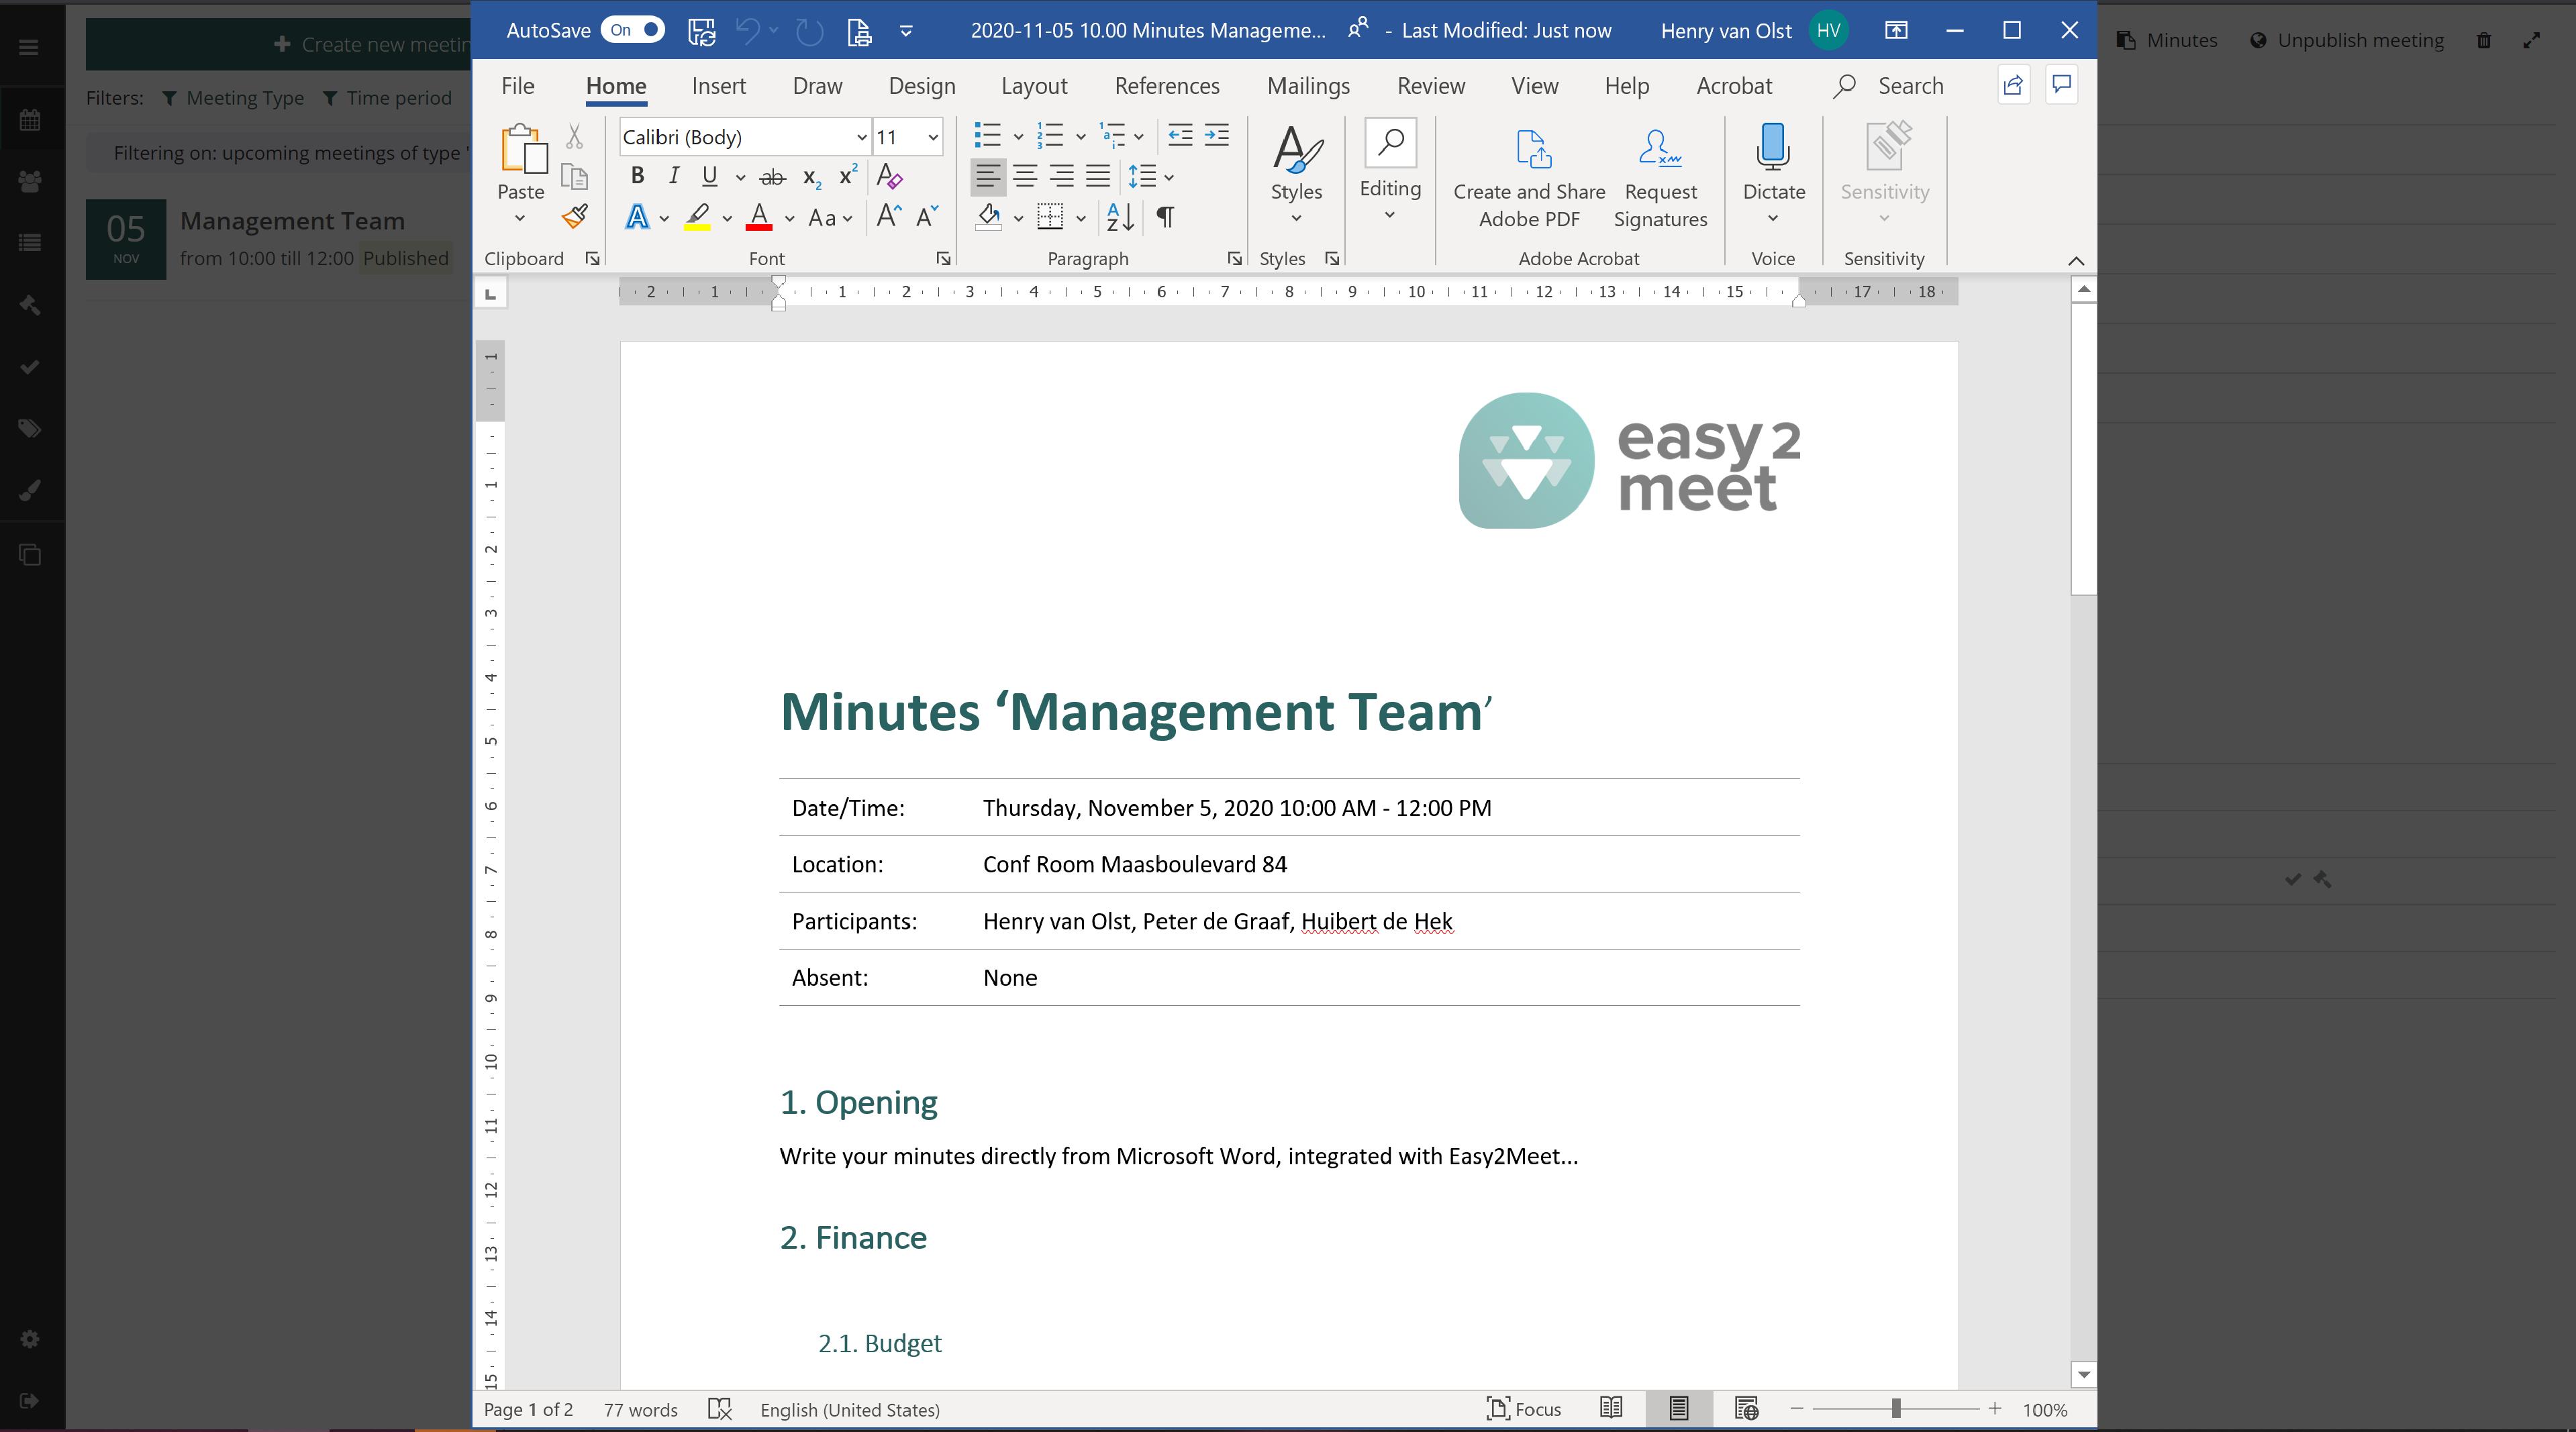 Easy2Meet Minutes